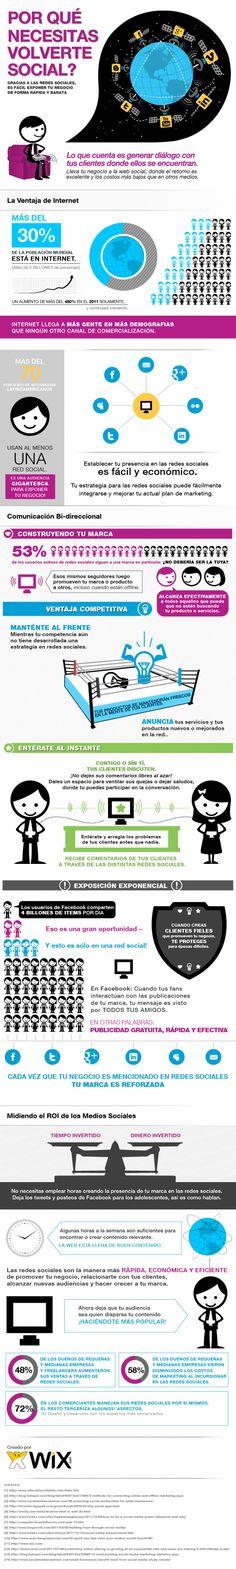 #Infografia #Curiosidades Por qué necesitas volverte Social. #TAVnews